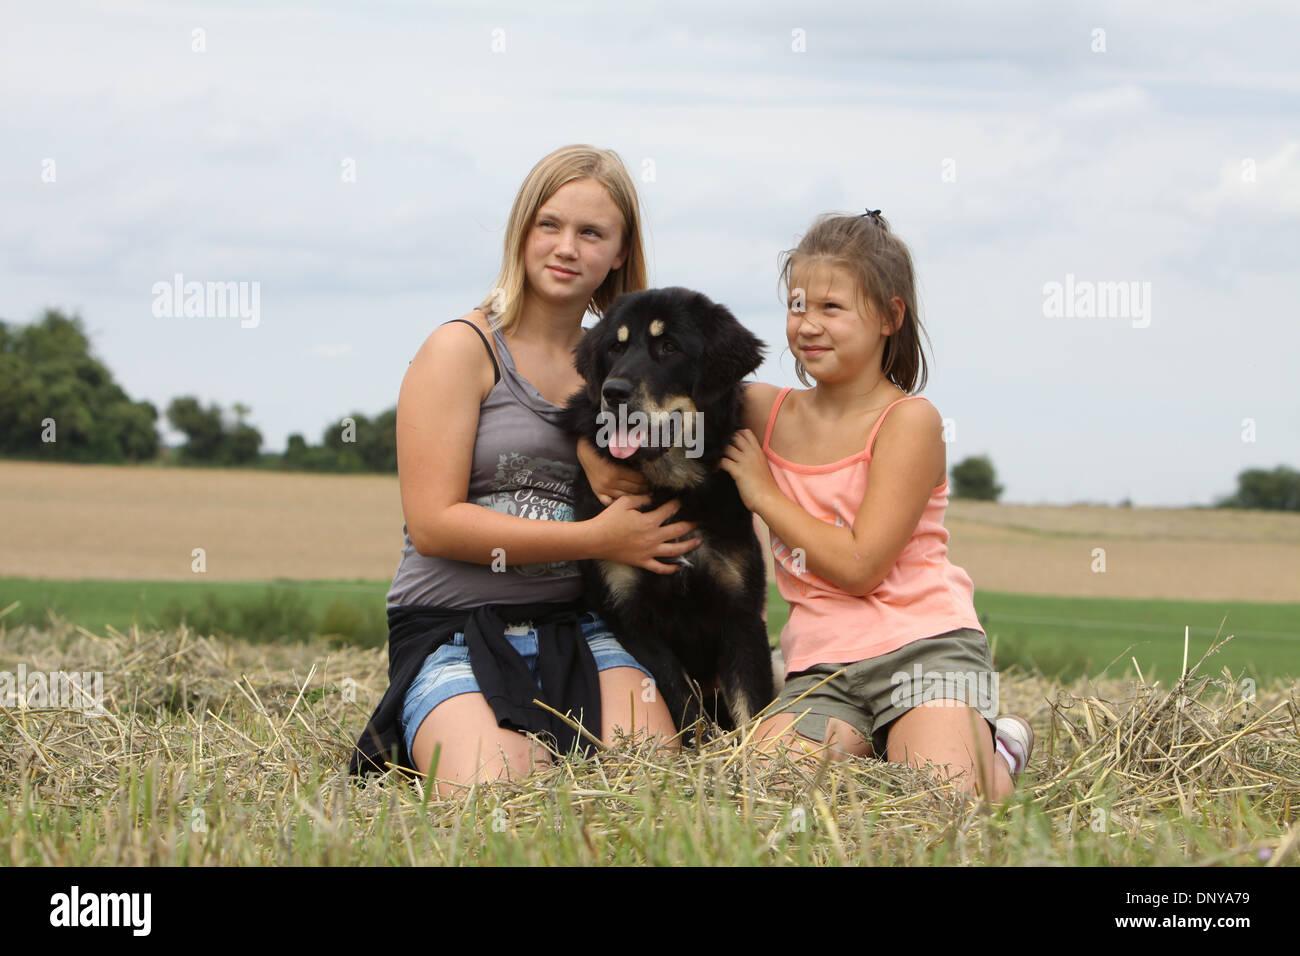 Dog Tibetan Mastiff / do-khyi / Tibetdogge adult and two girls in a field - Stock Image